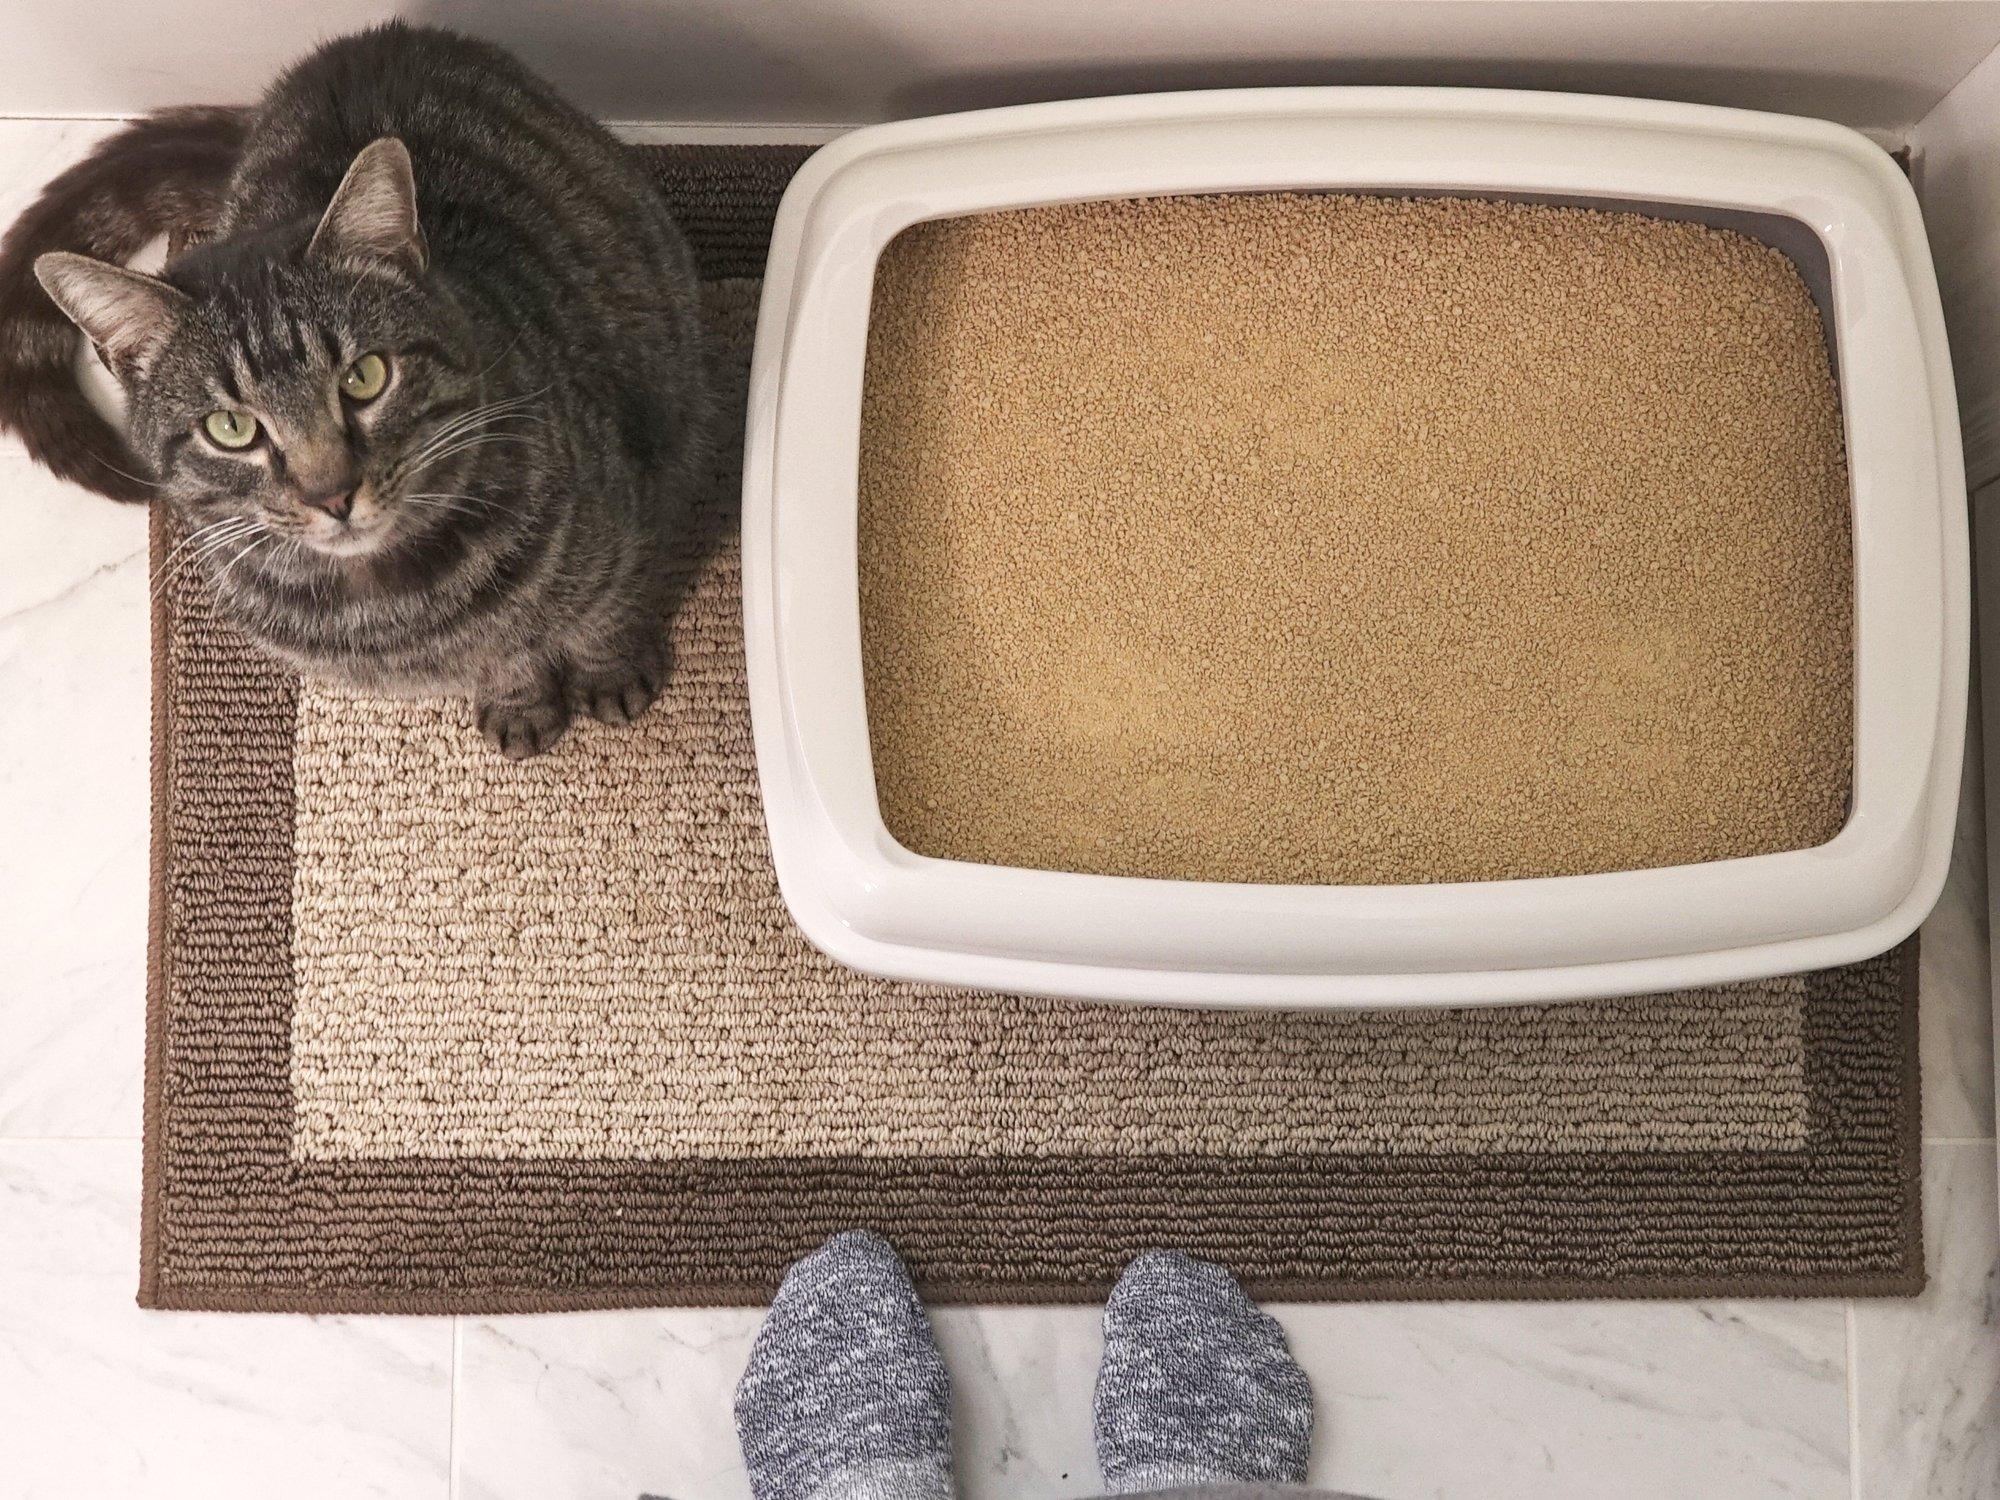 World's Best Cat Litter, Scented Clumping Litter Formula for Multiple Cats, 28-Pounds by World's Best Cat Litter